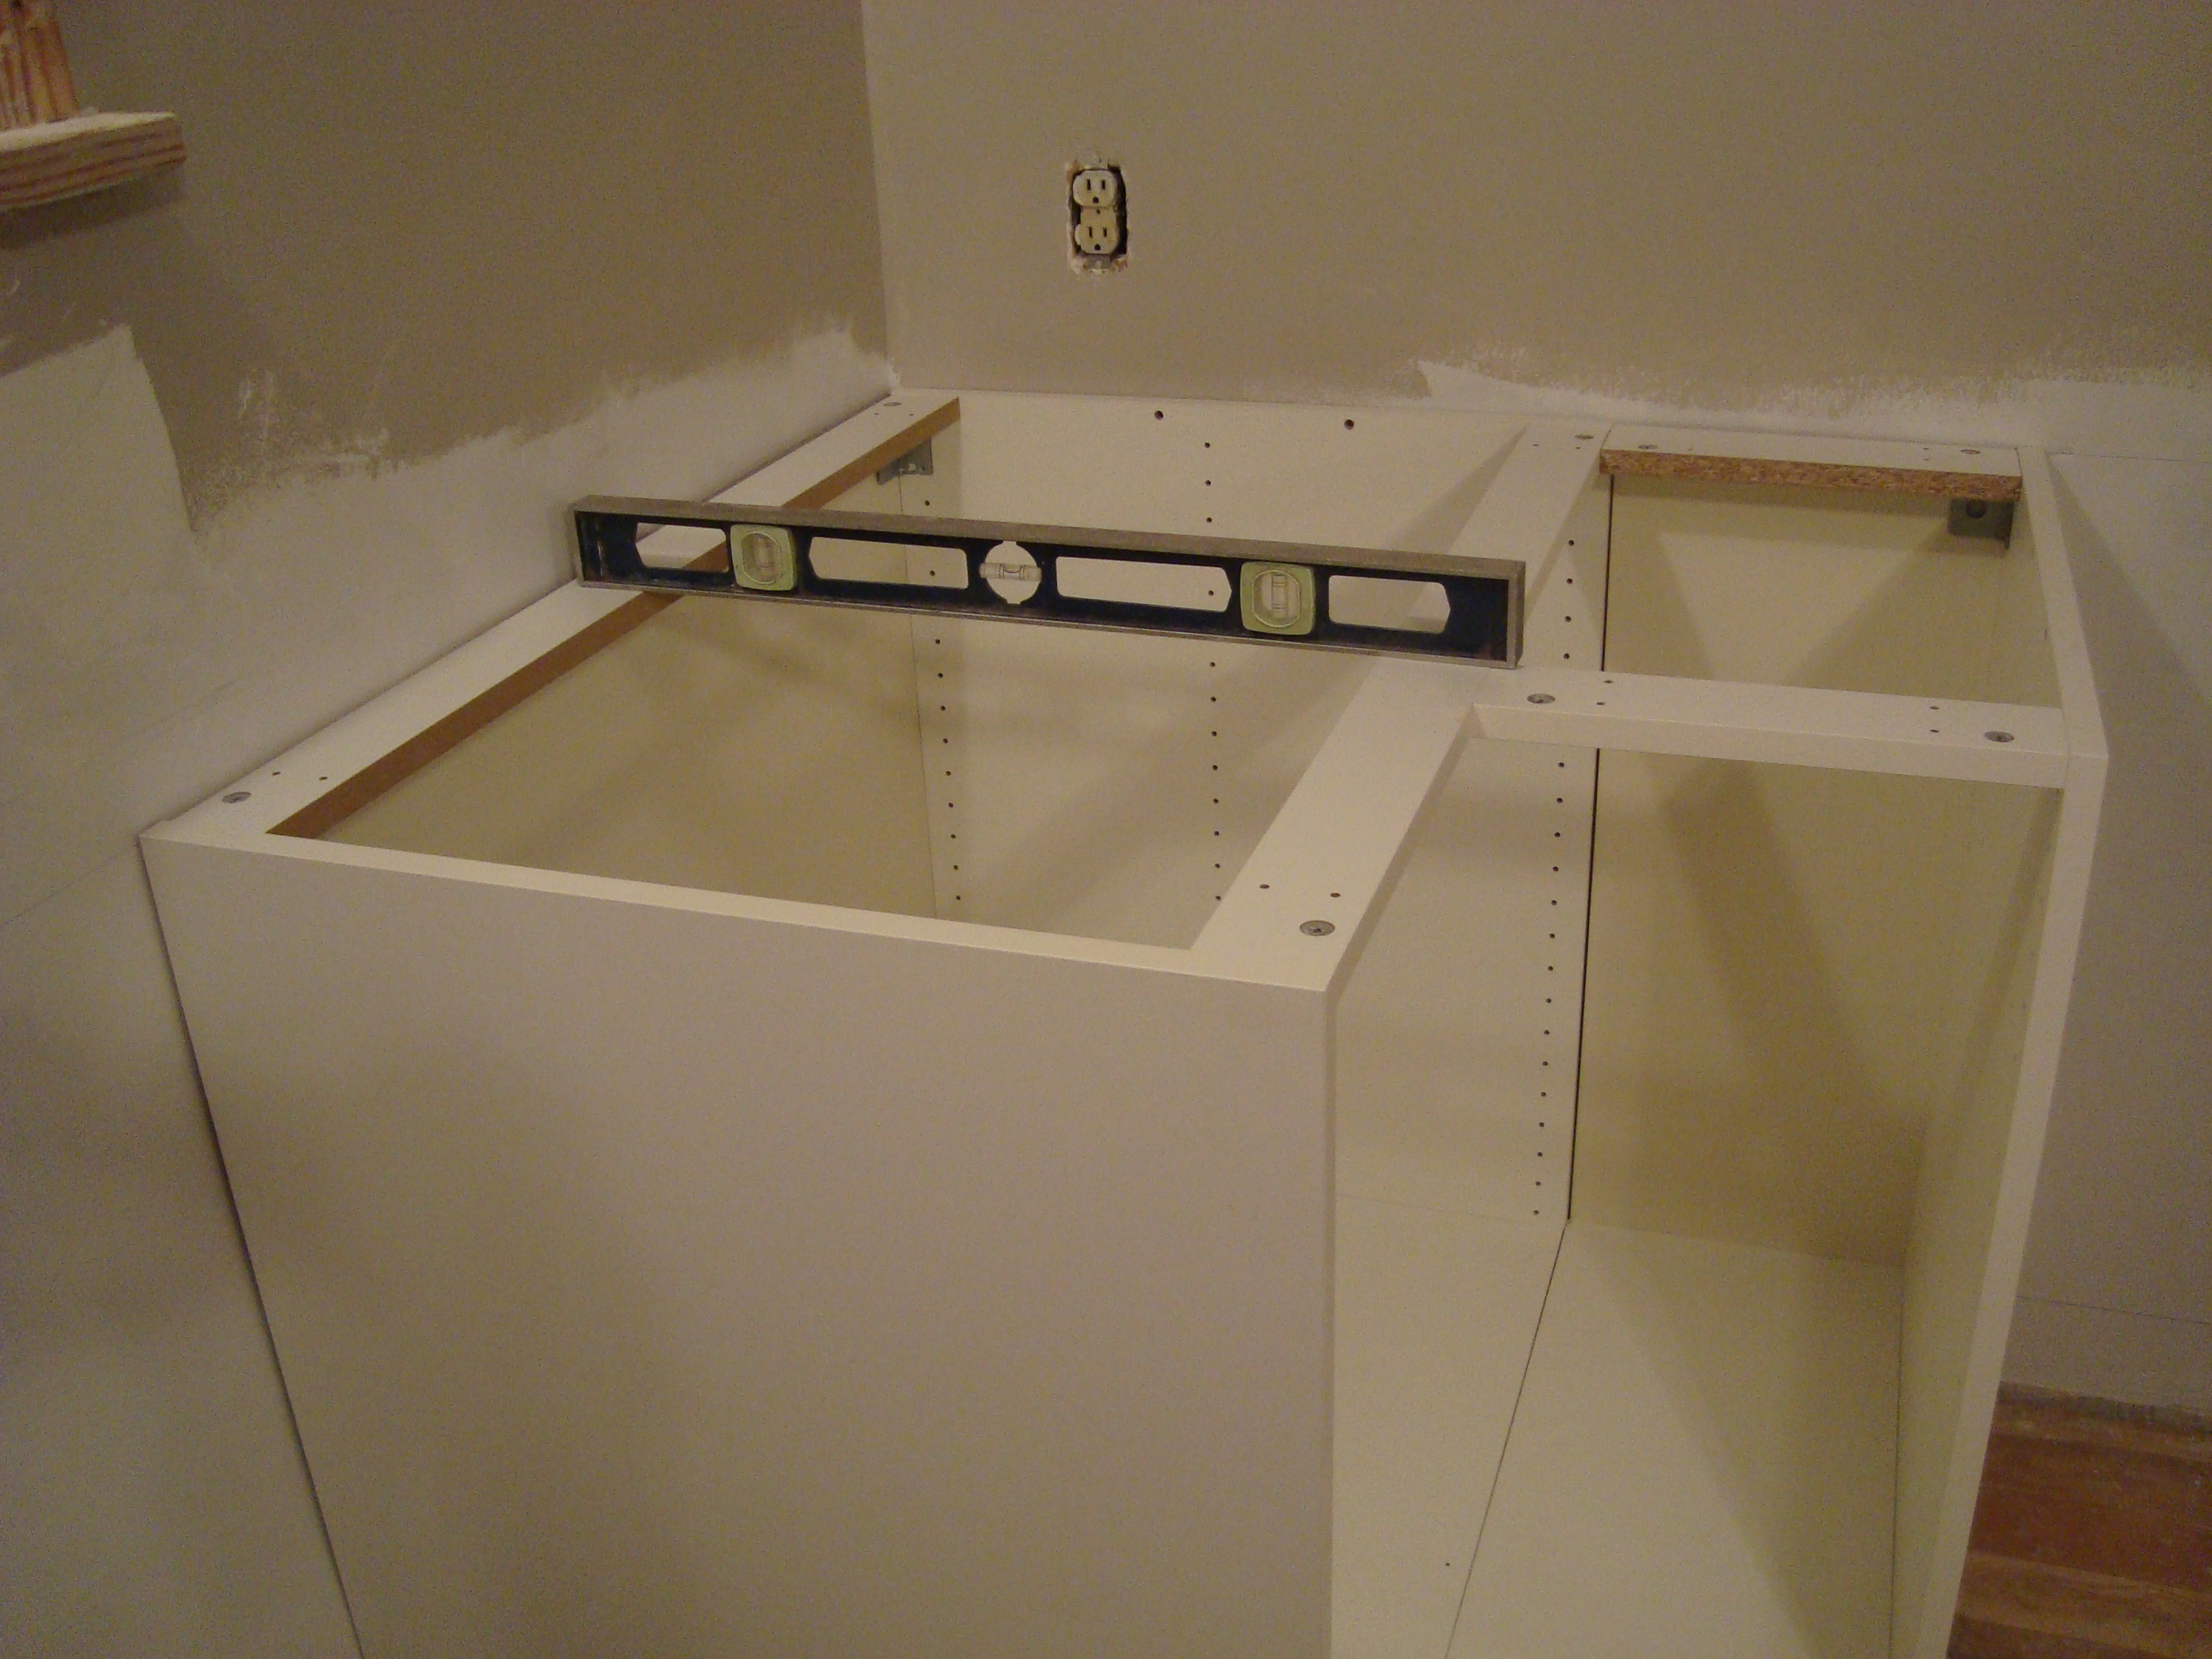 an och 10 step program installing kitchen cabinets kitchen sink cabinets Step